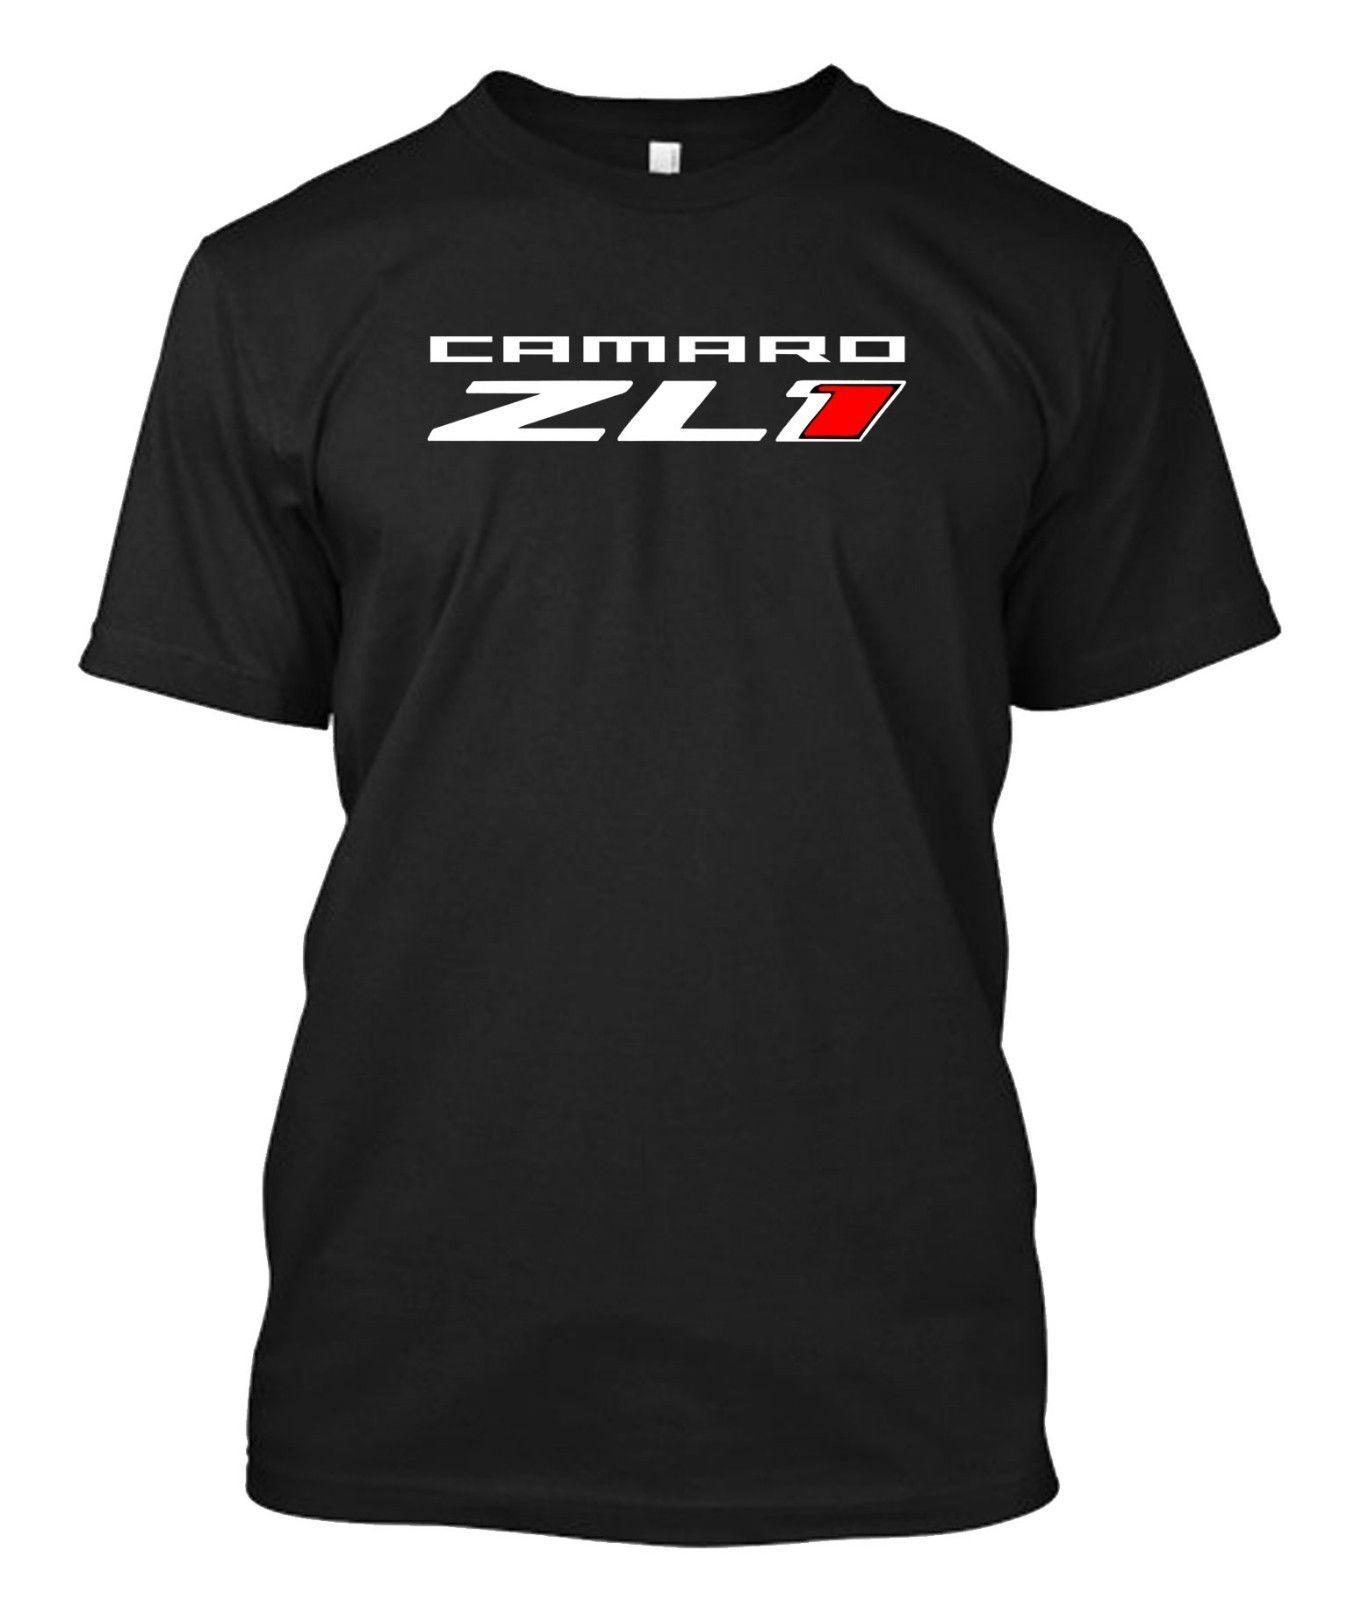 Custom Men/'s Black T-Shirt Tee CORVETTE CAMARO ZL1 Logo Racing